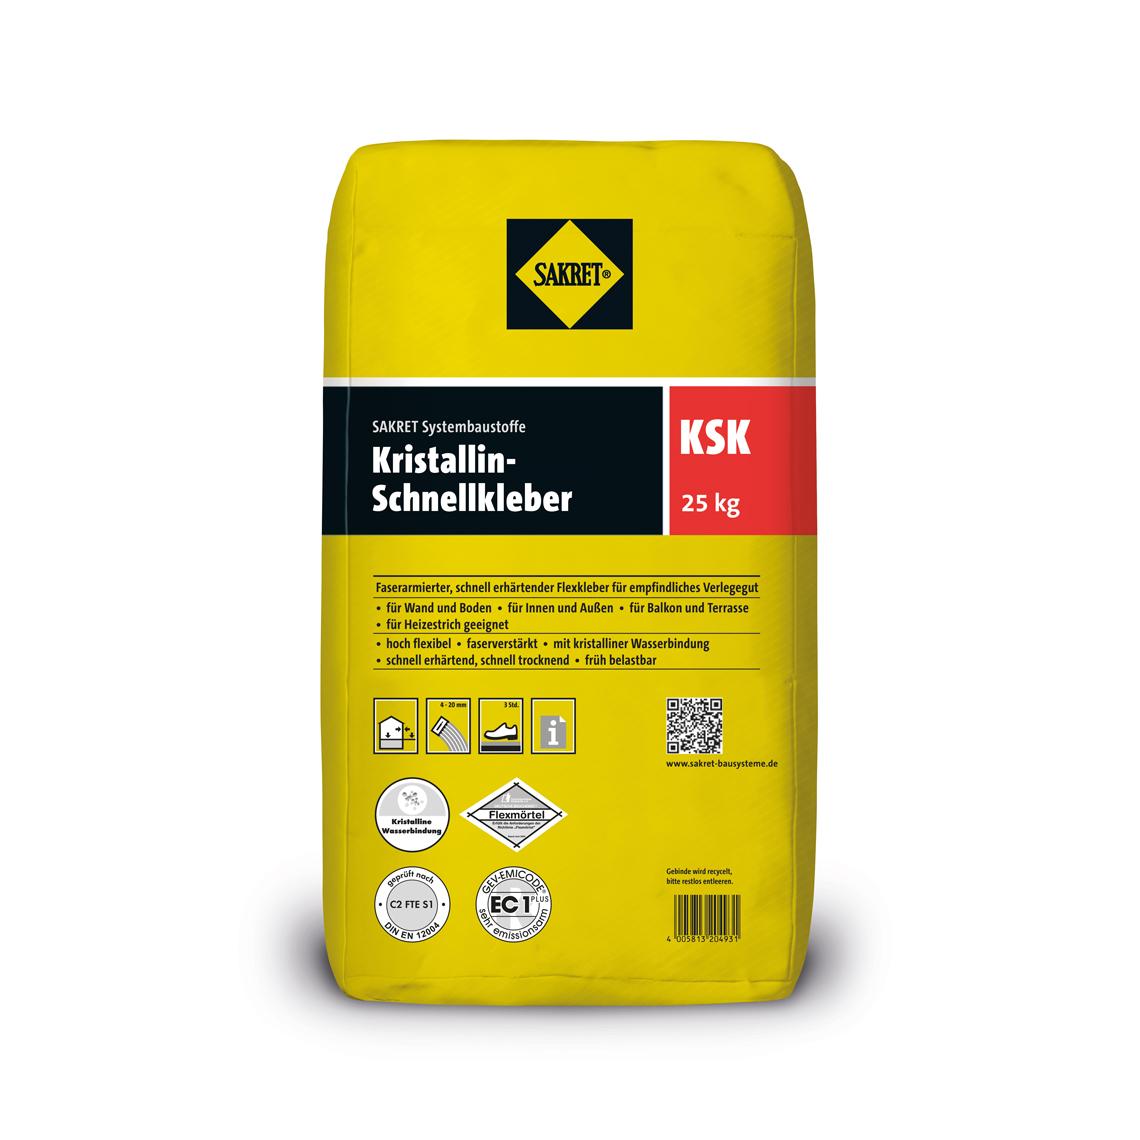 SAKRET Kristallin-Schnellkleber KSK